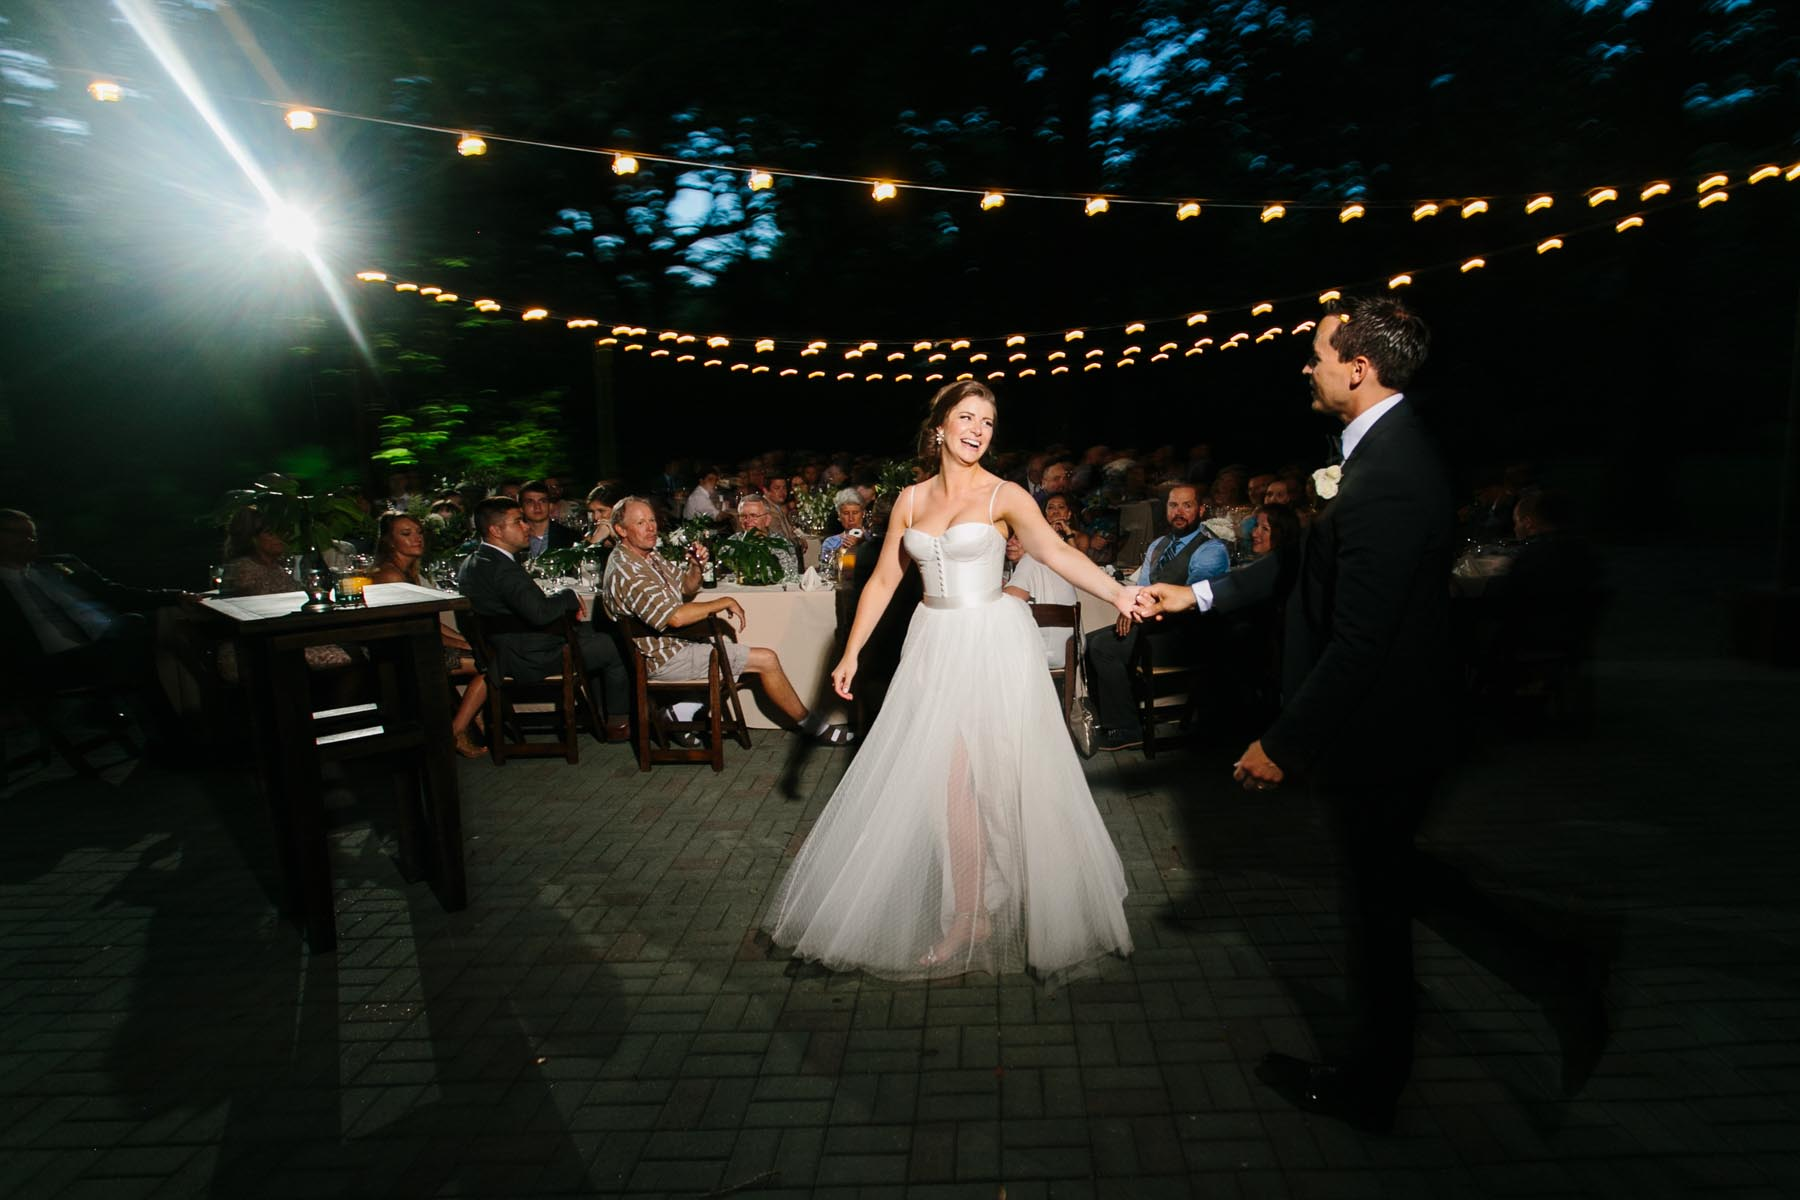 lowry wedding blog eden garden florida wedding-131